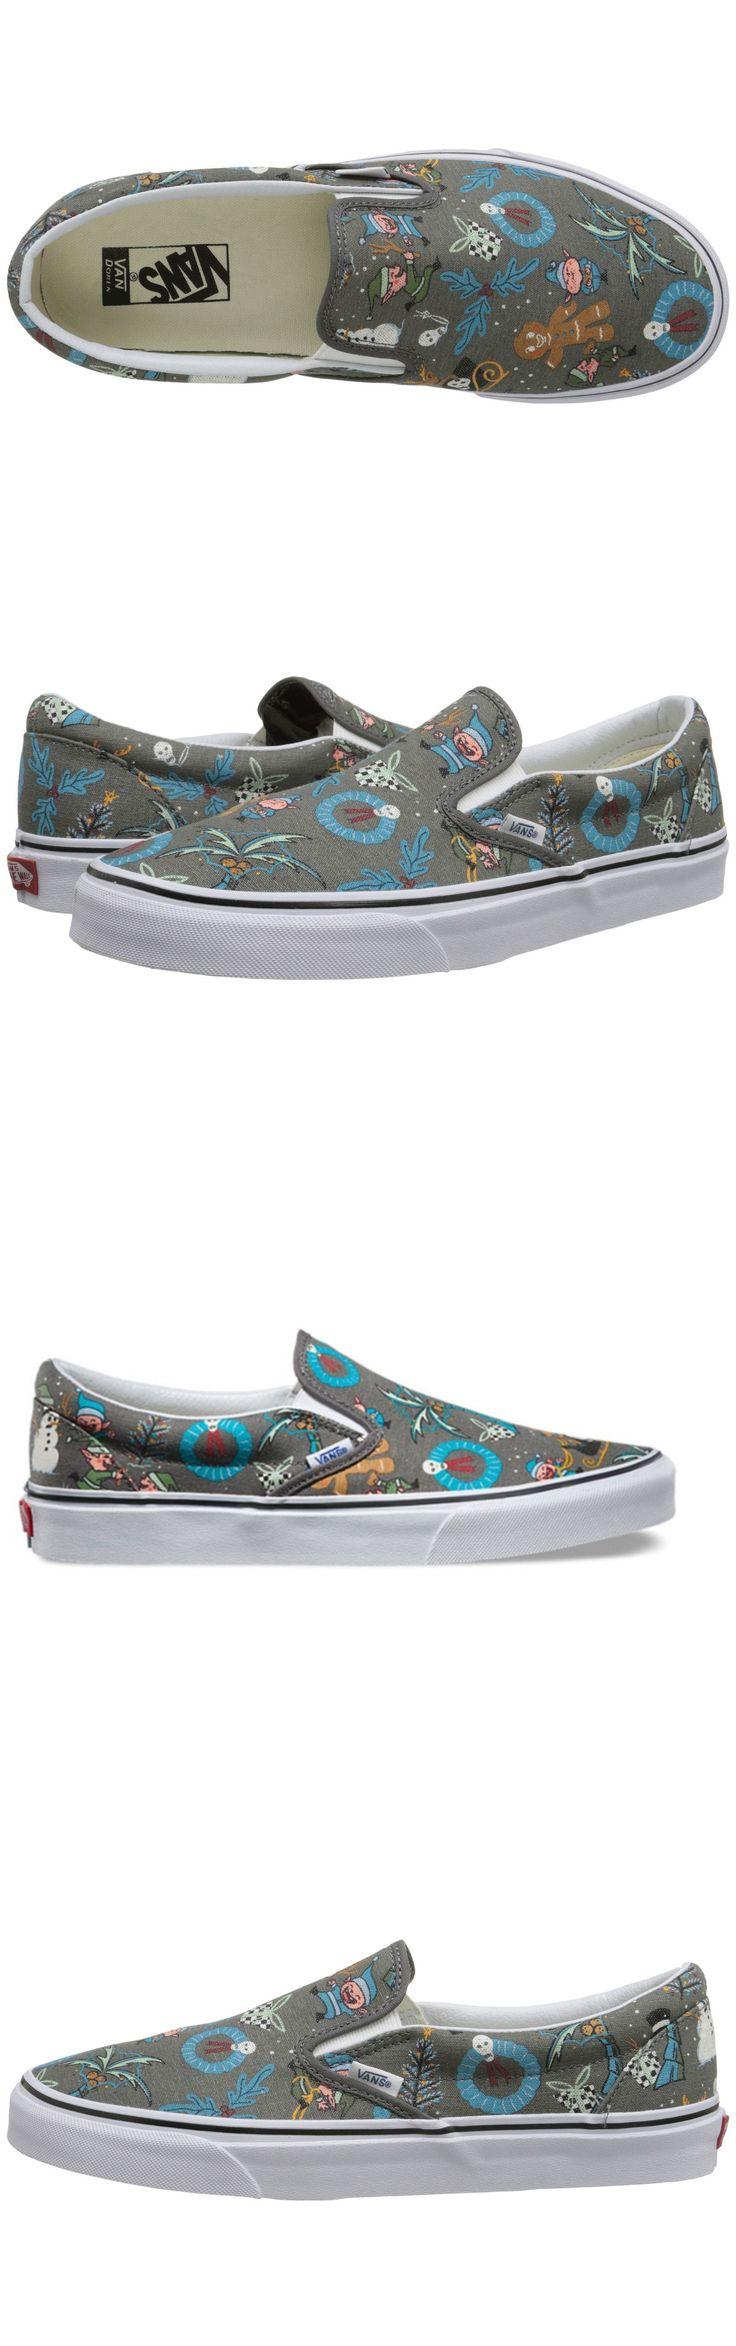 Other Skateboarding Clothing 159079: Vans Classic Slip-On Kids Shoes Van Doren Holiday Pewter Women S Size 5 Kids 3.5 -> BUY IT NOW ONLY: $30.52 on eBay!